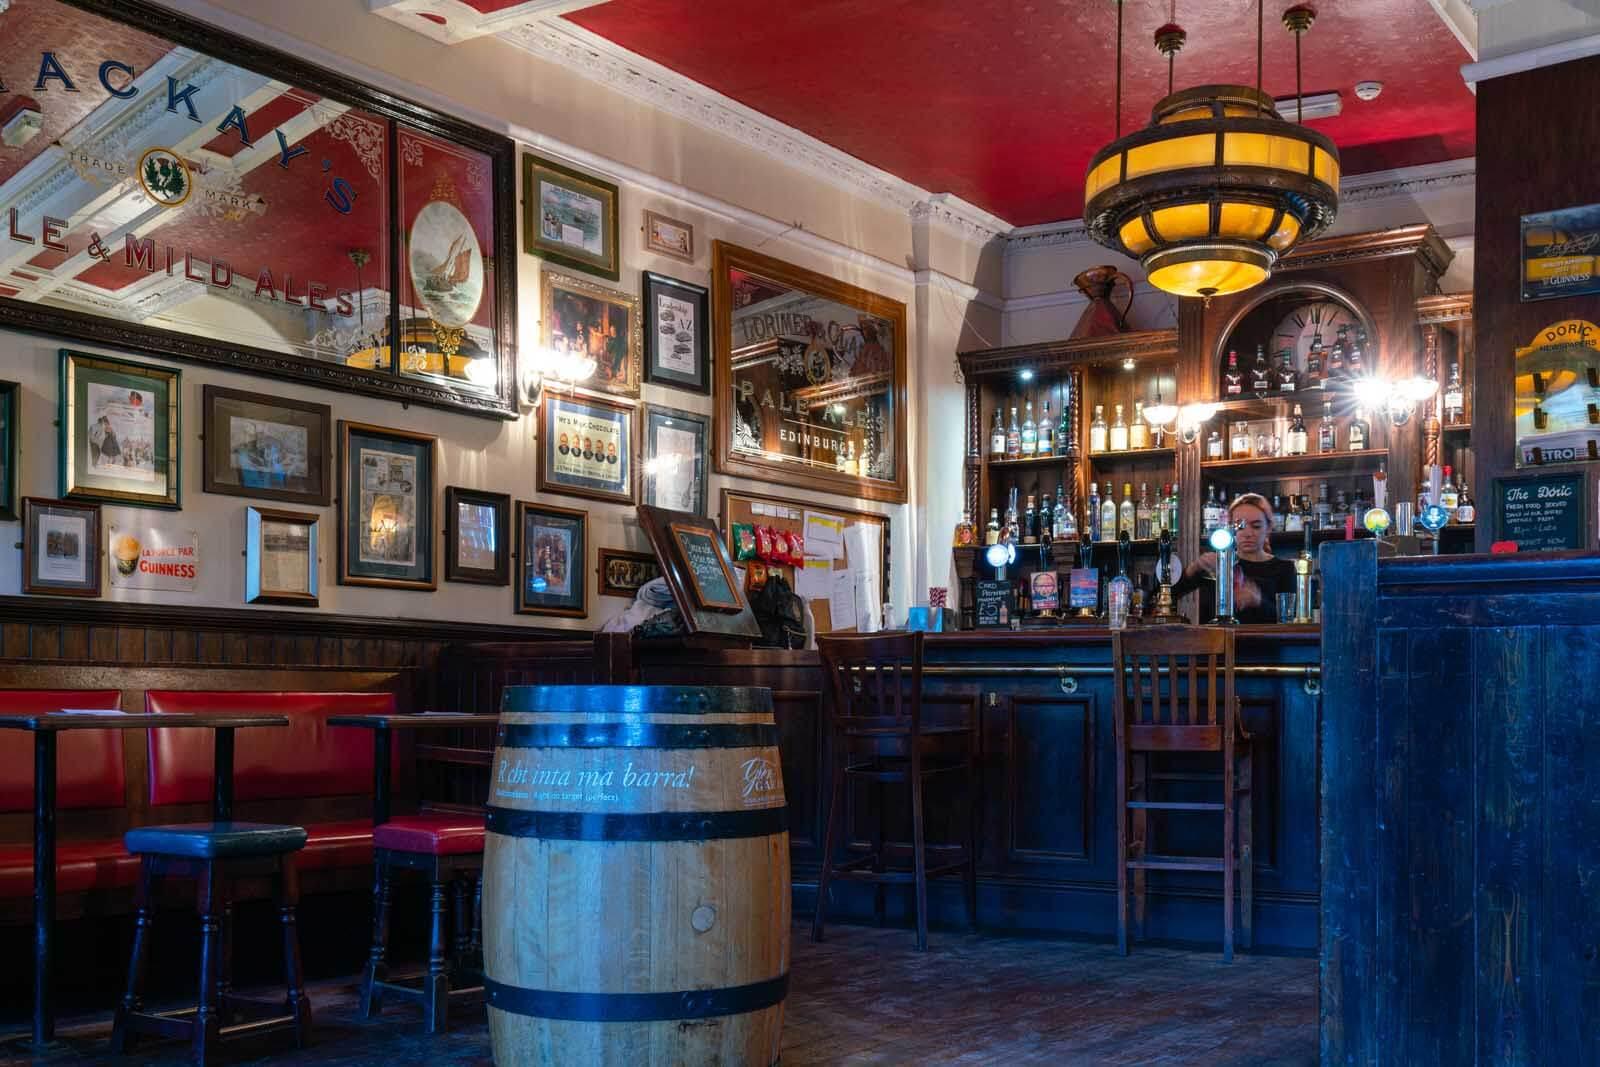 Inside the Doric pub in Edinburgh